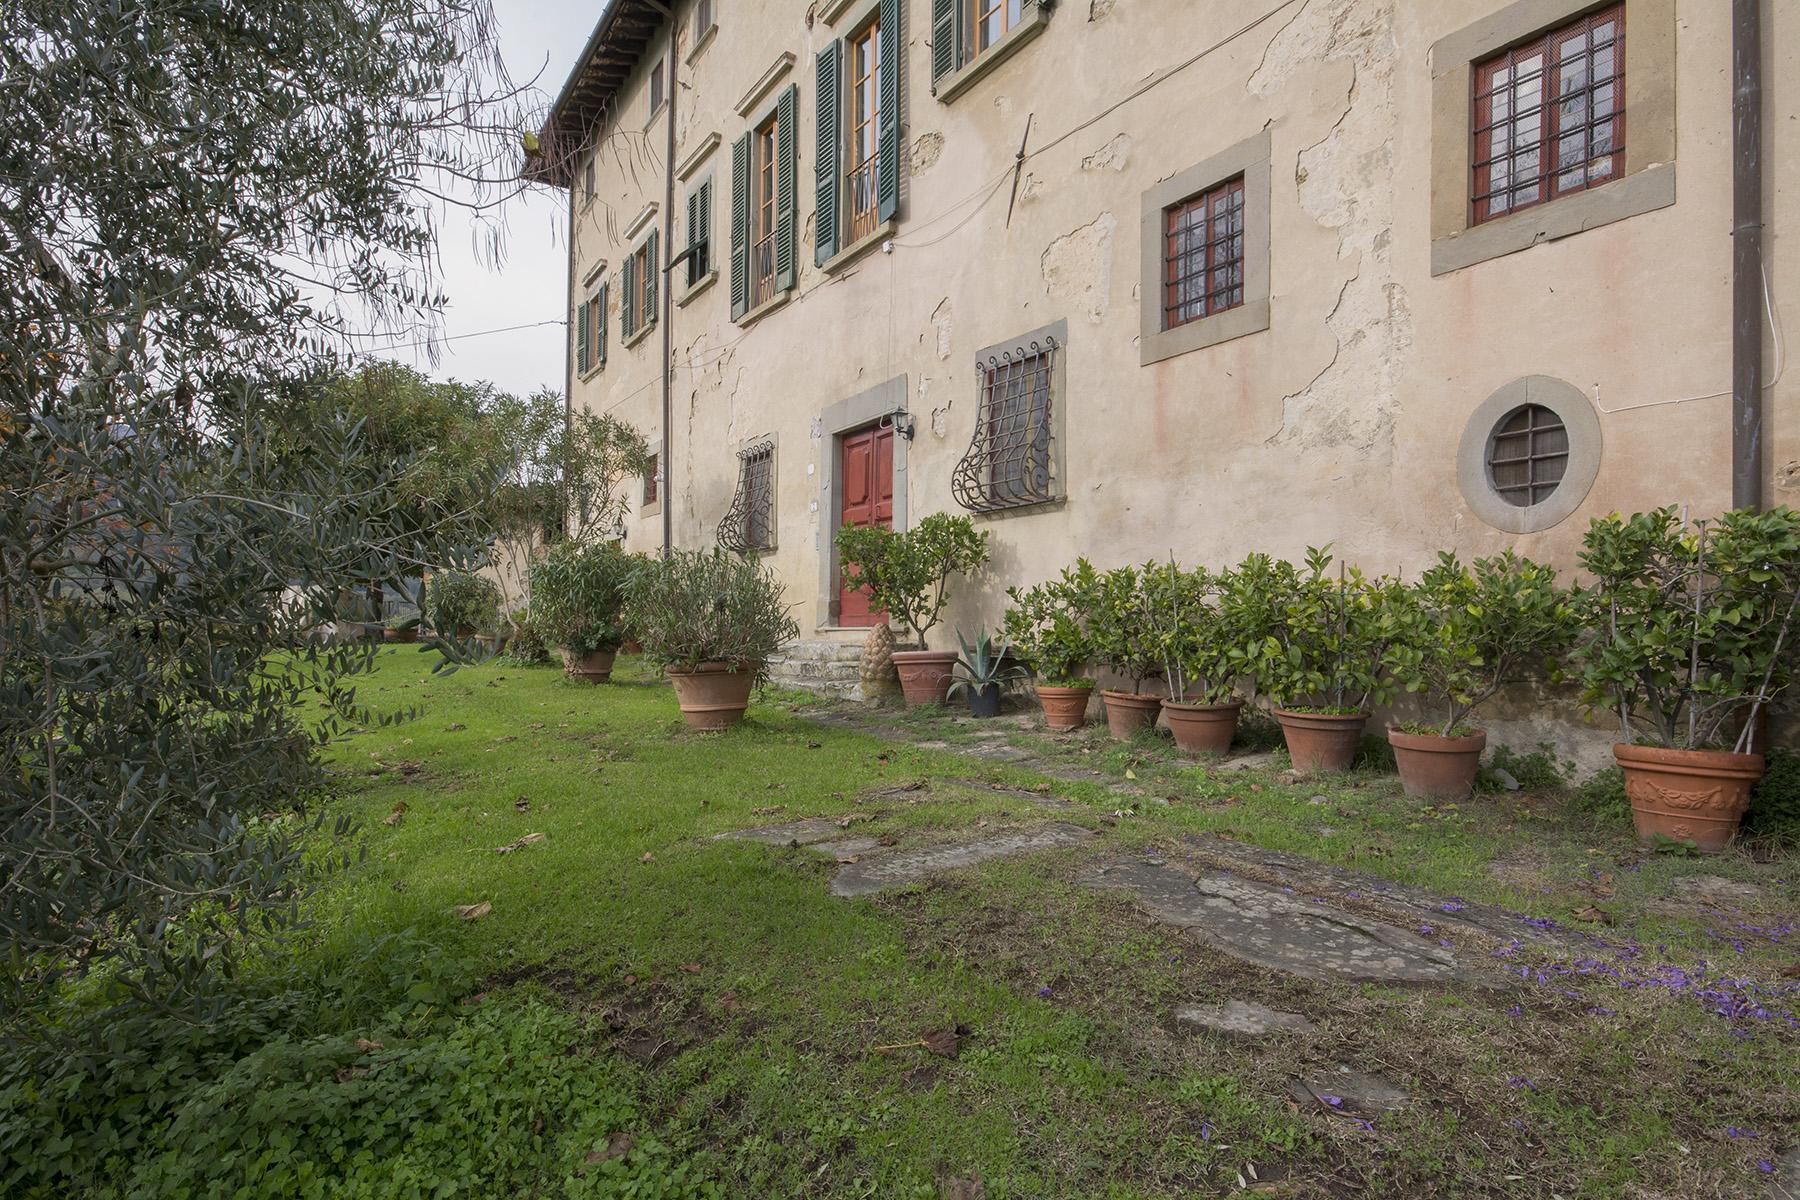 Additional photo for property listing at Merveilleuse appartement dans la campagne Toscane Via San Vito Pistoia, Pistoia 51100 Italie